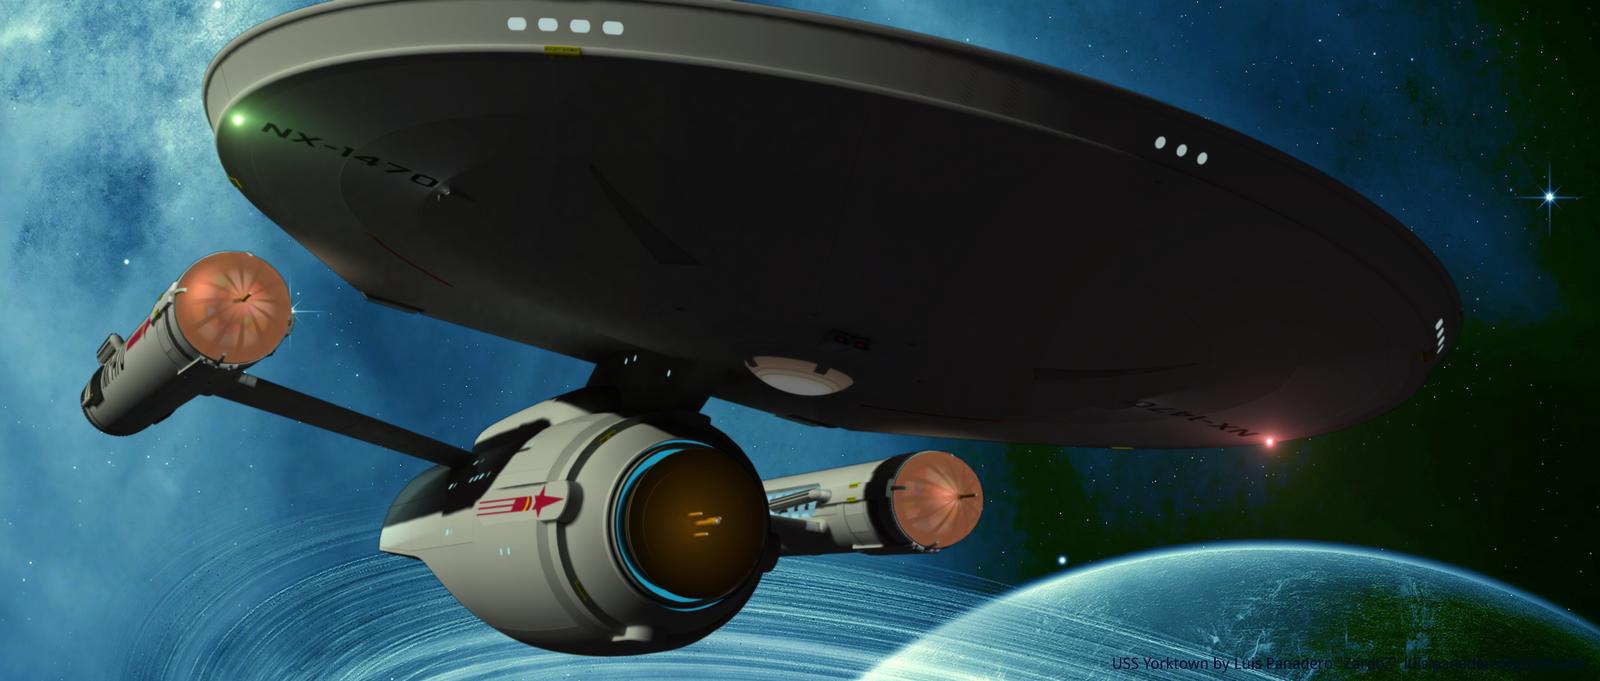 nebula render - photo #31